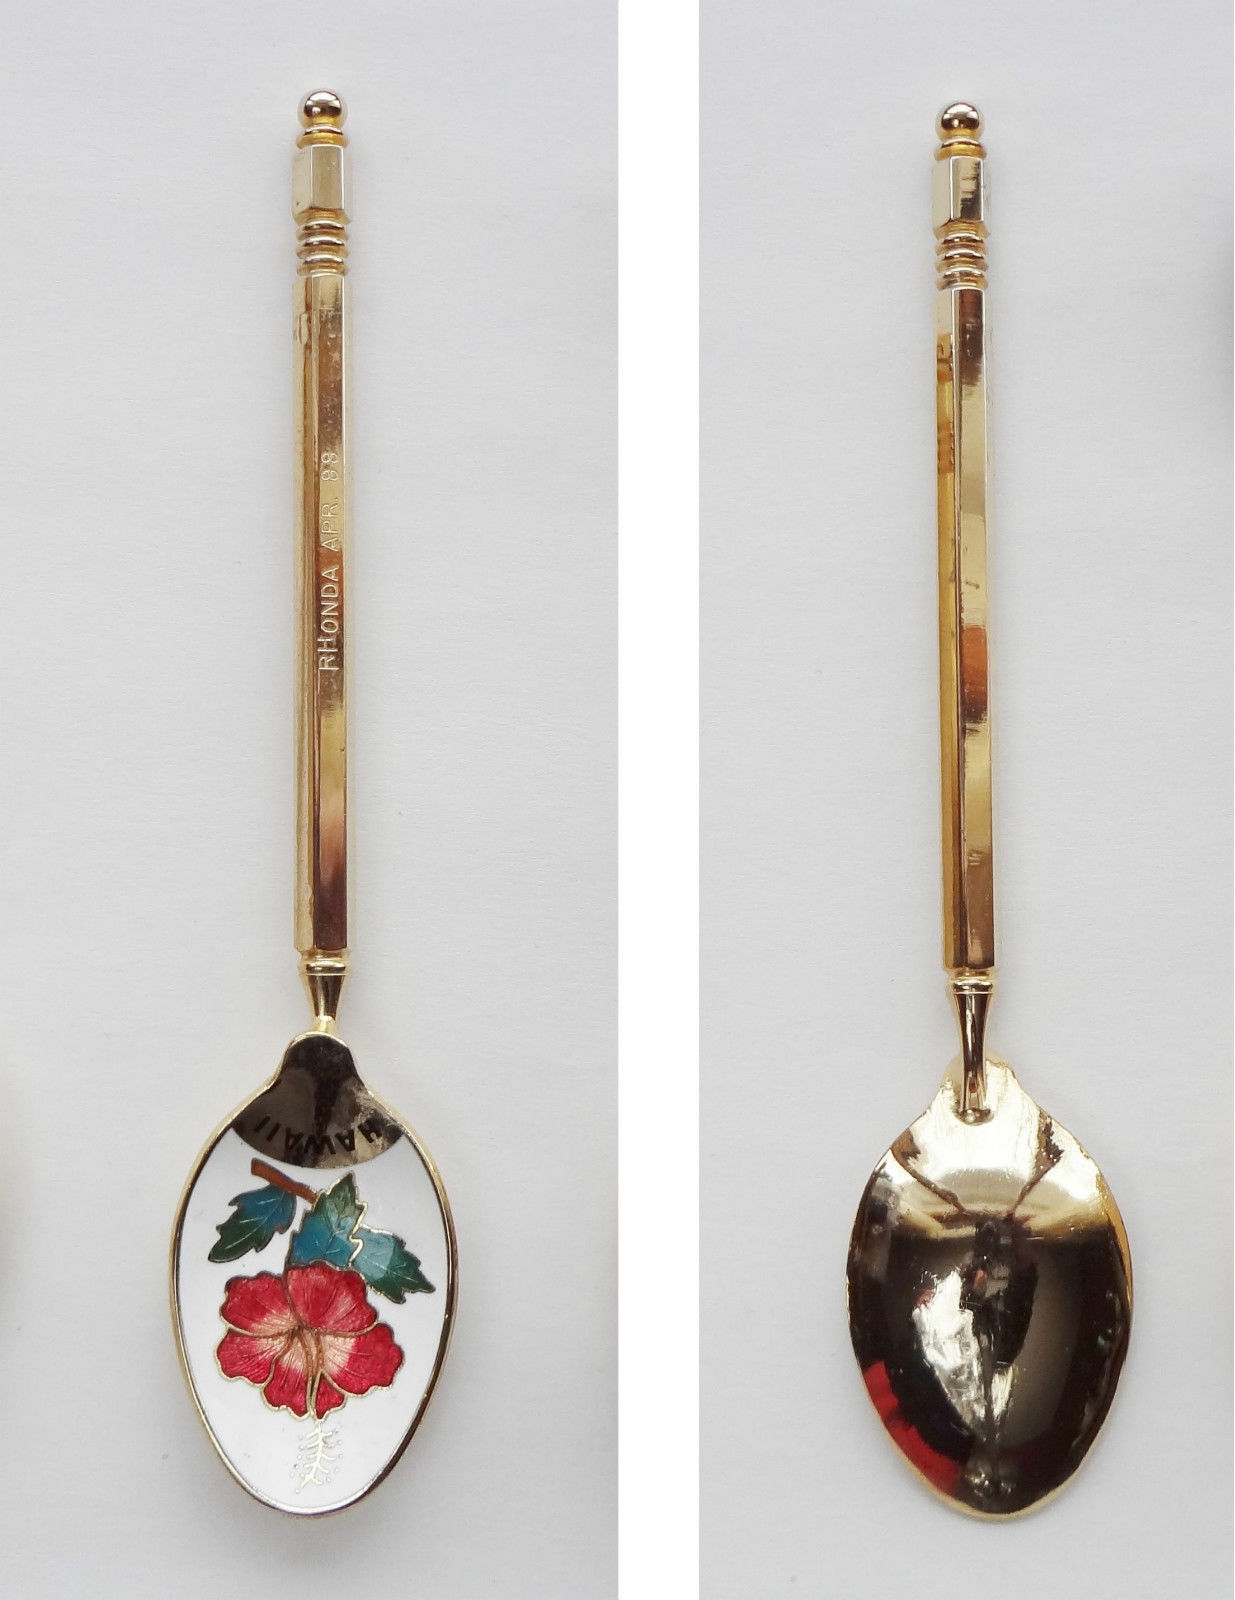 Collector Souvenir Spoon USA Hawaii Hibiscus Cloisonne Bowl Rhonda Apr. 88